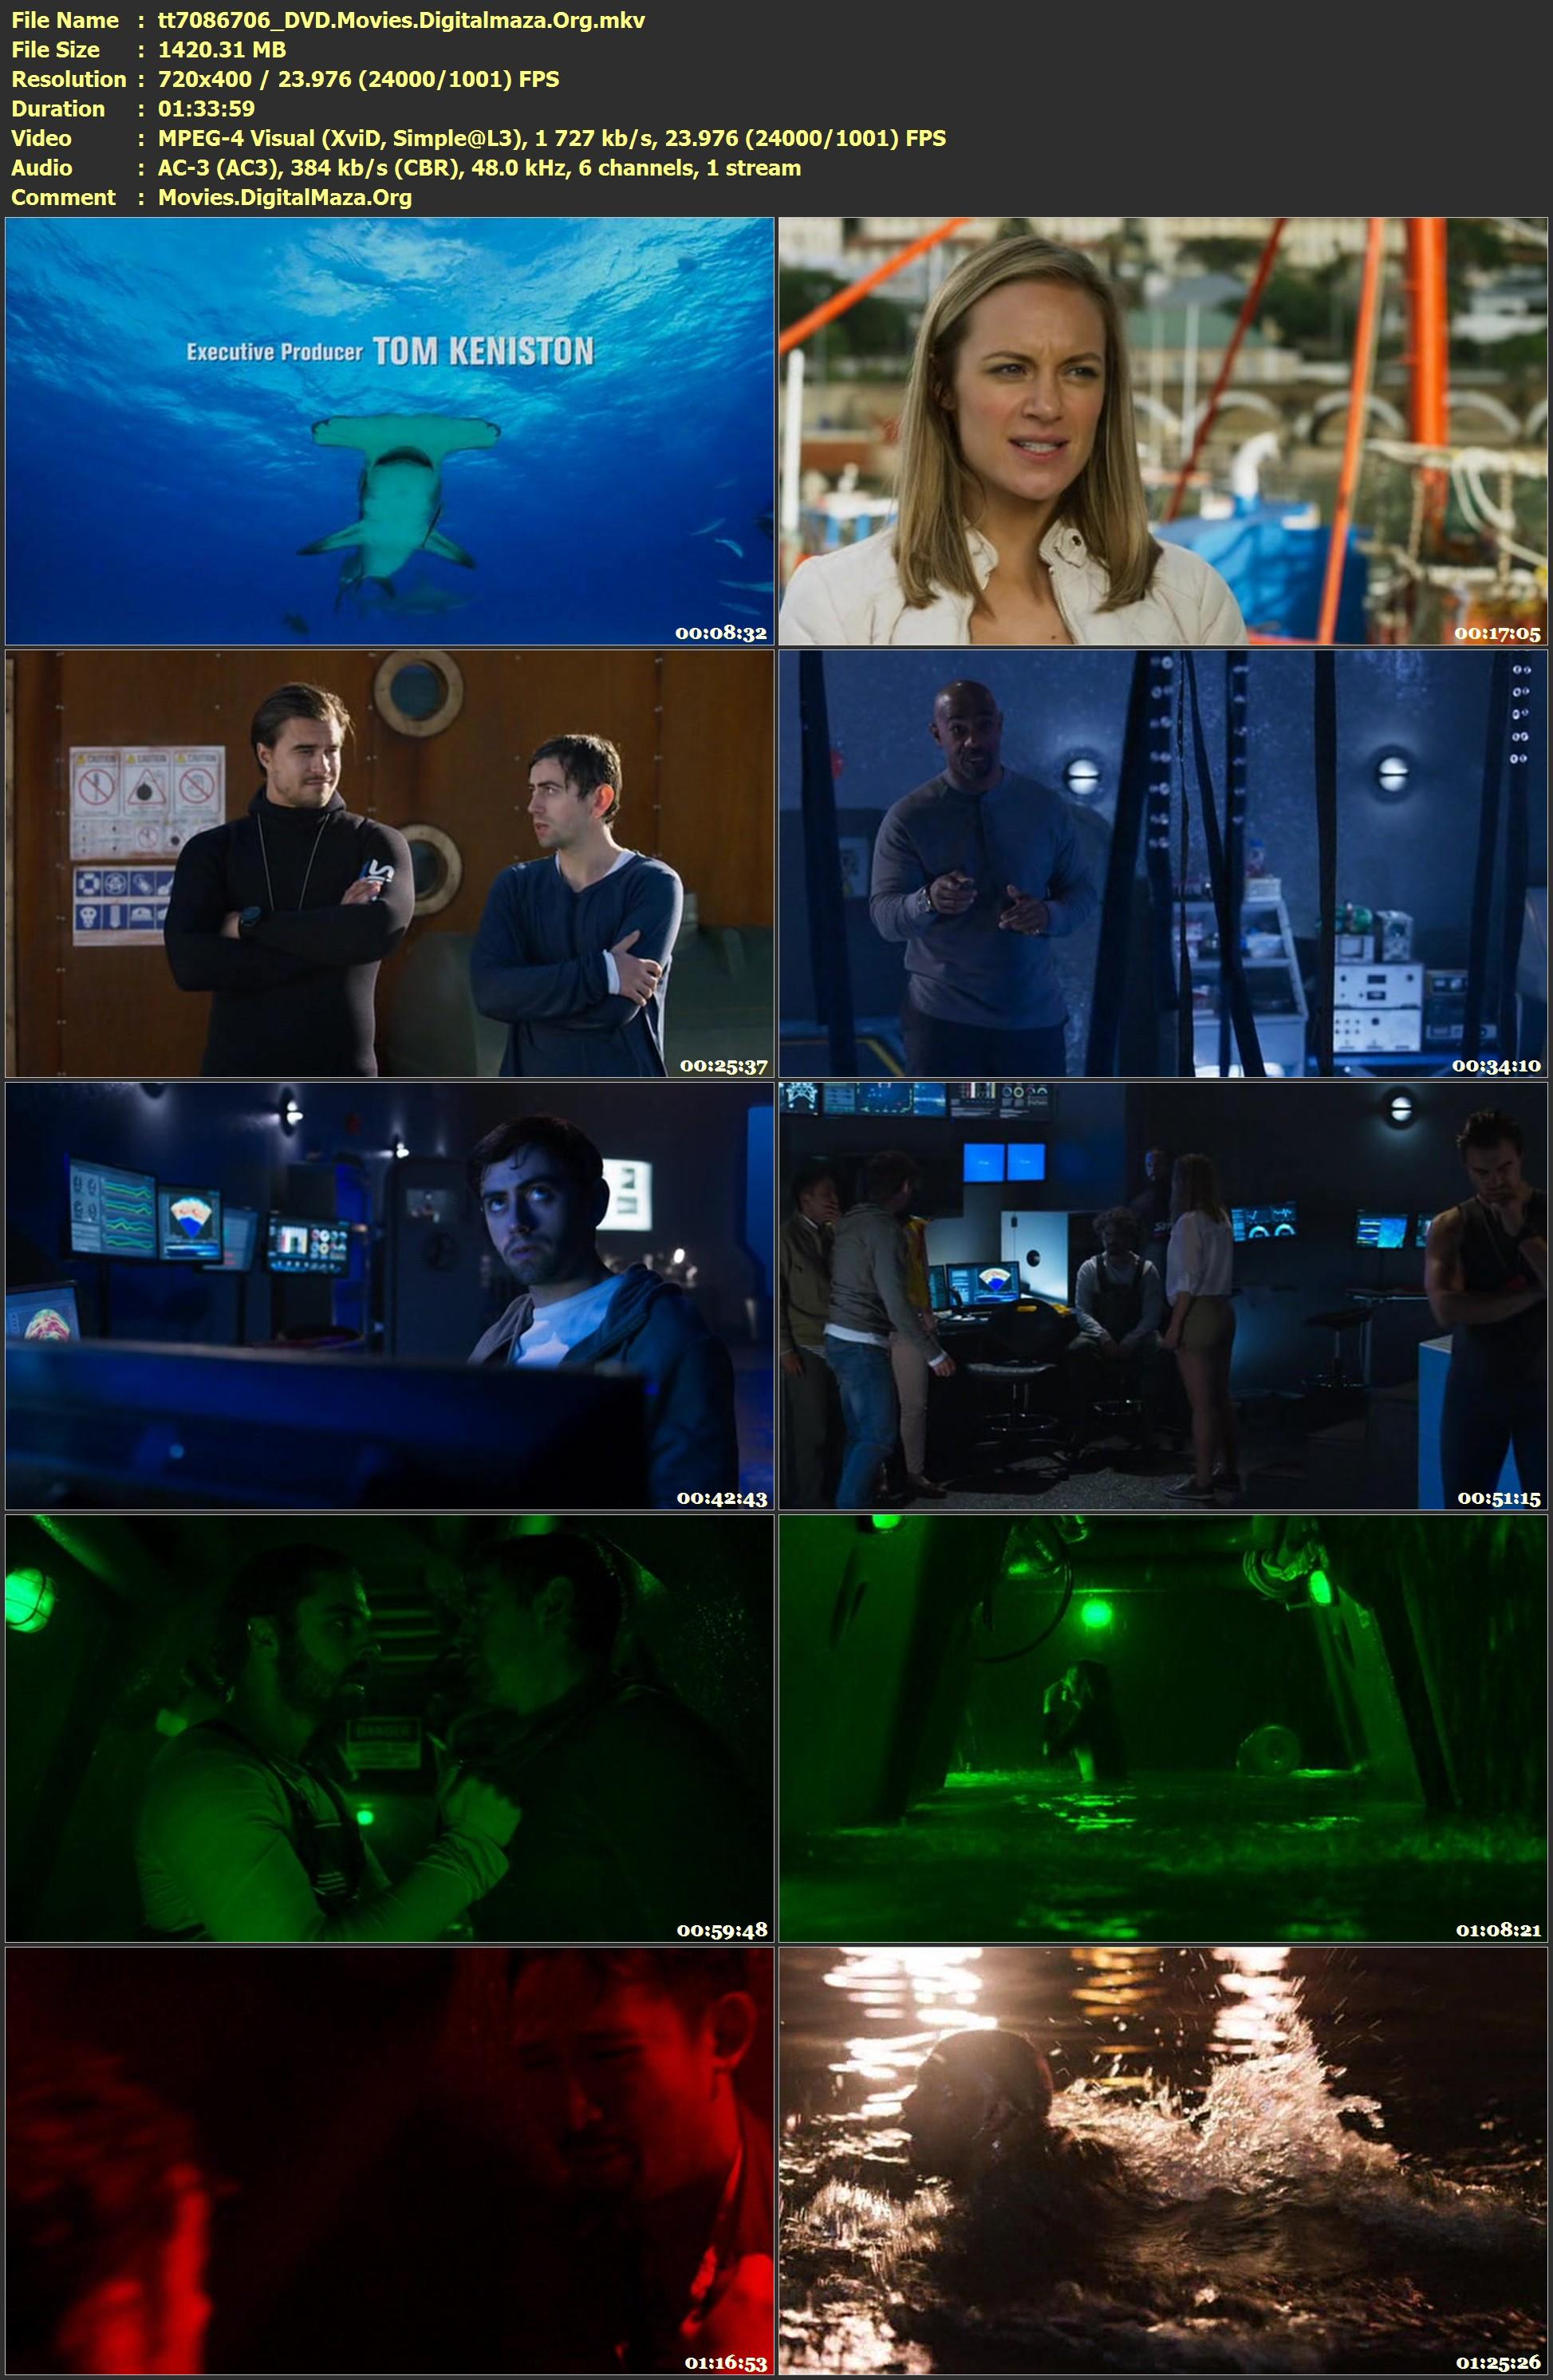 https://image.ibb.co/ej3jSH/tt7086706_DVD_Movies_Digitalmaza_Org_mkv.jpg